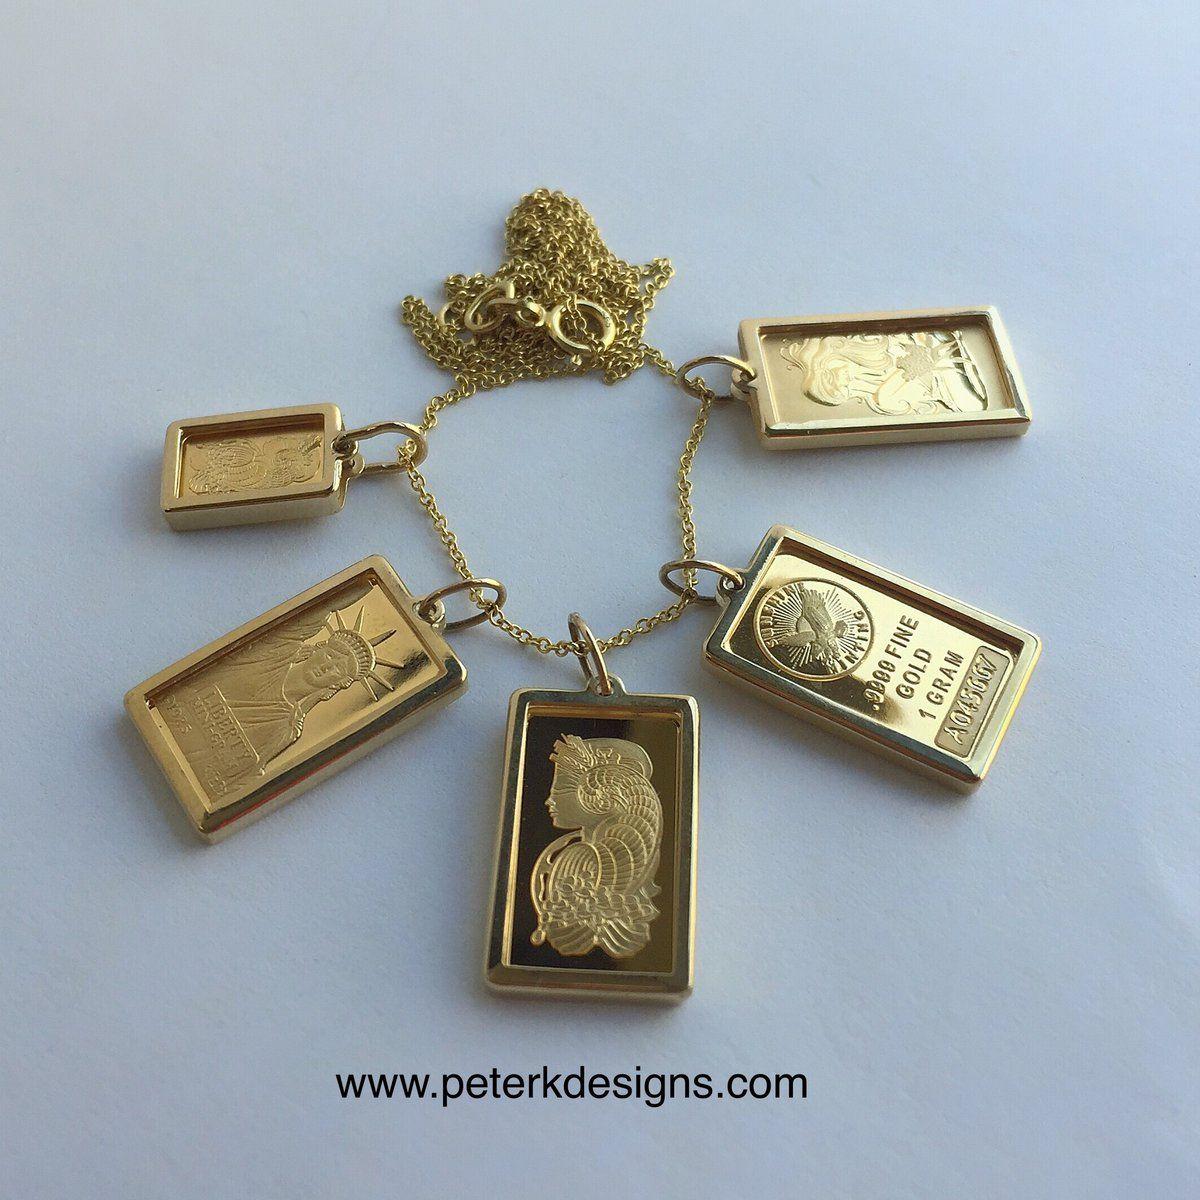 180 Pendant Necklaces Ideas Pendant Pendant Necklace Jewelry